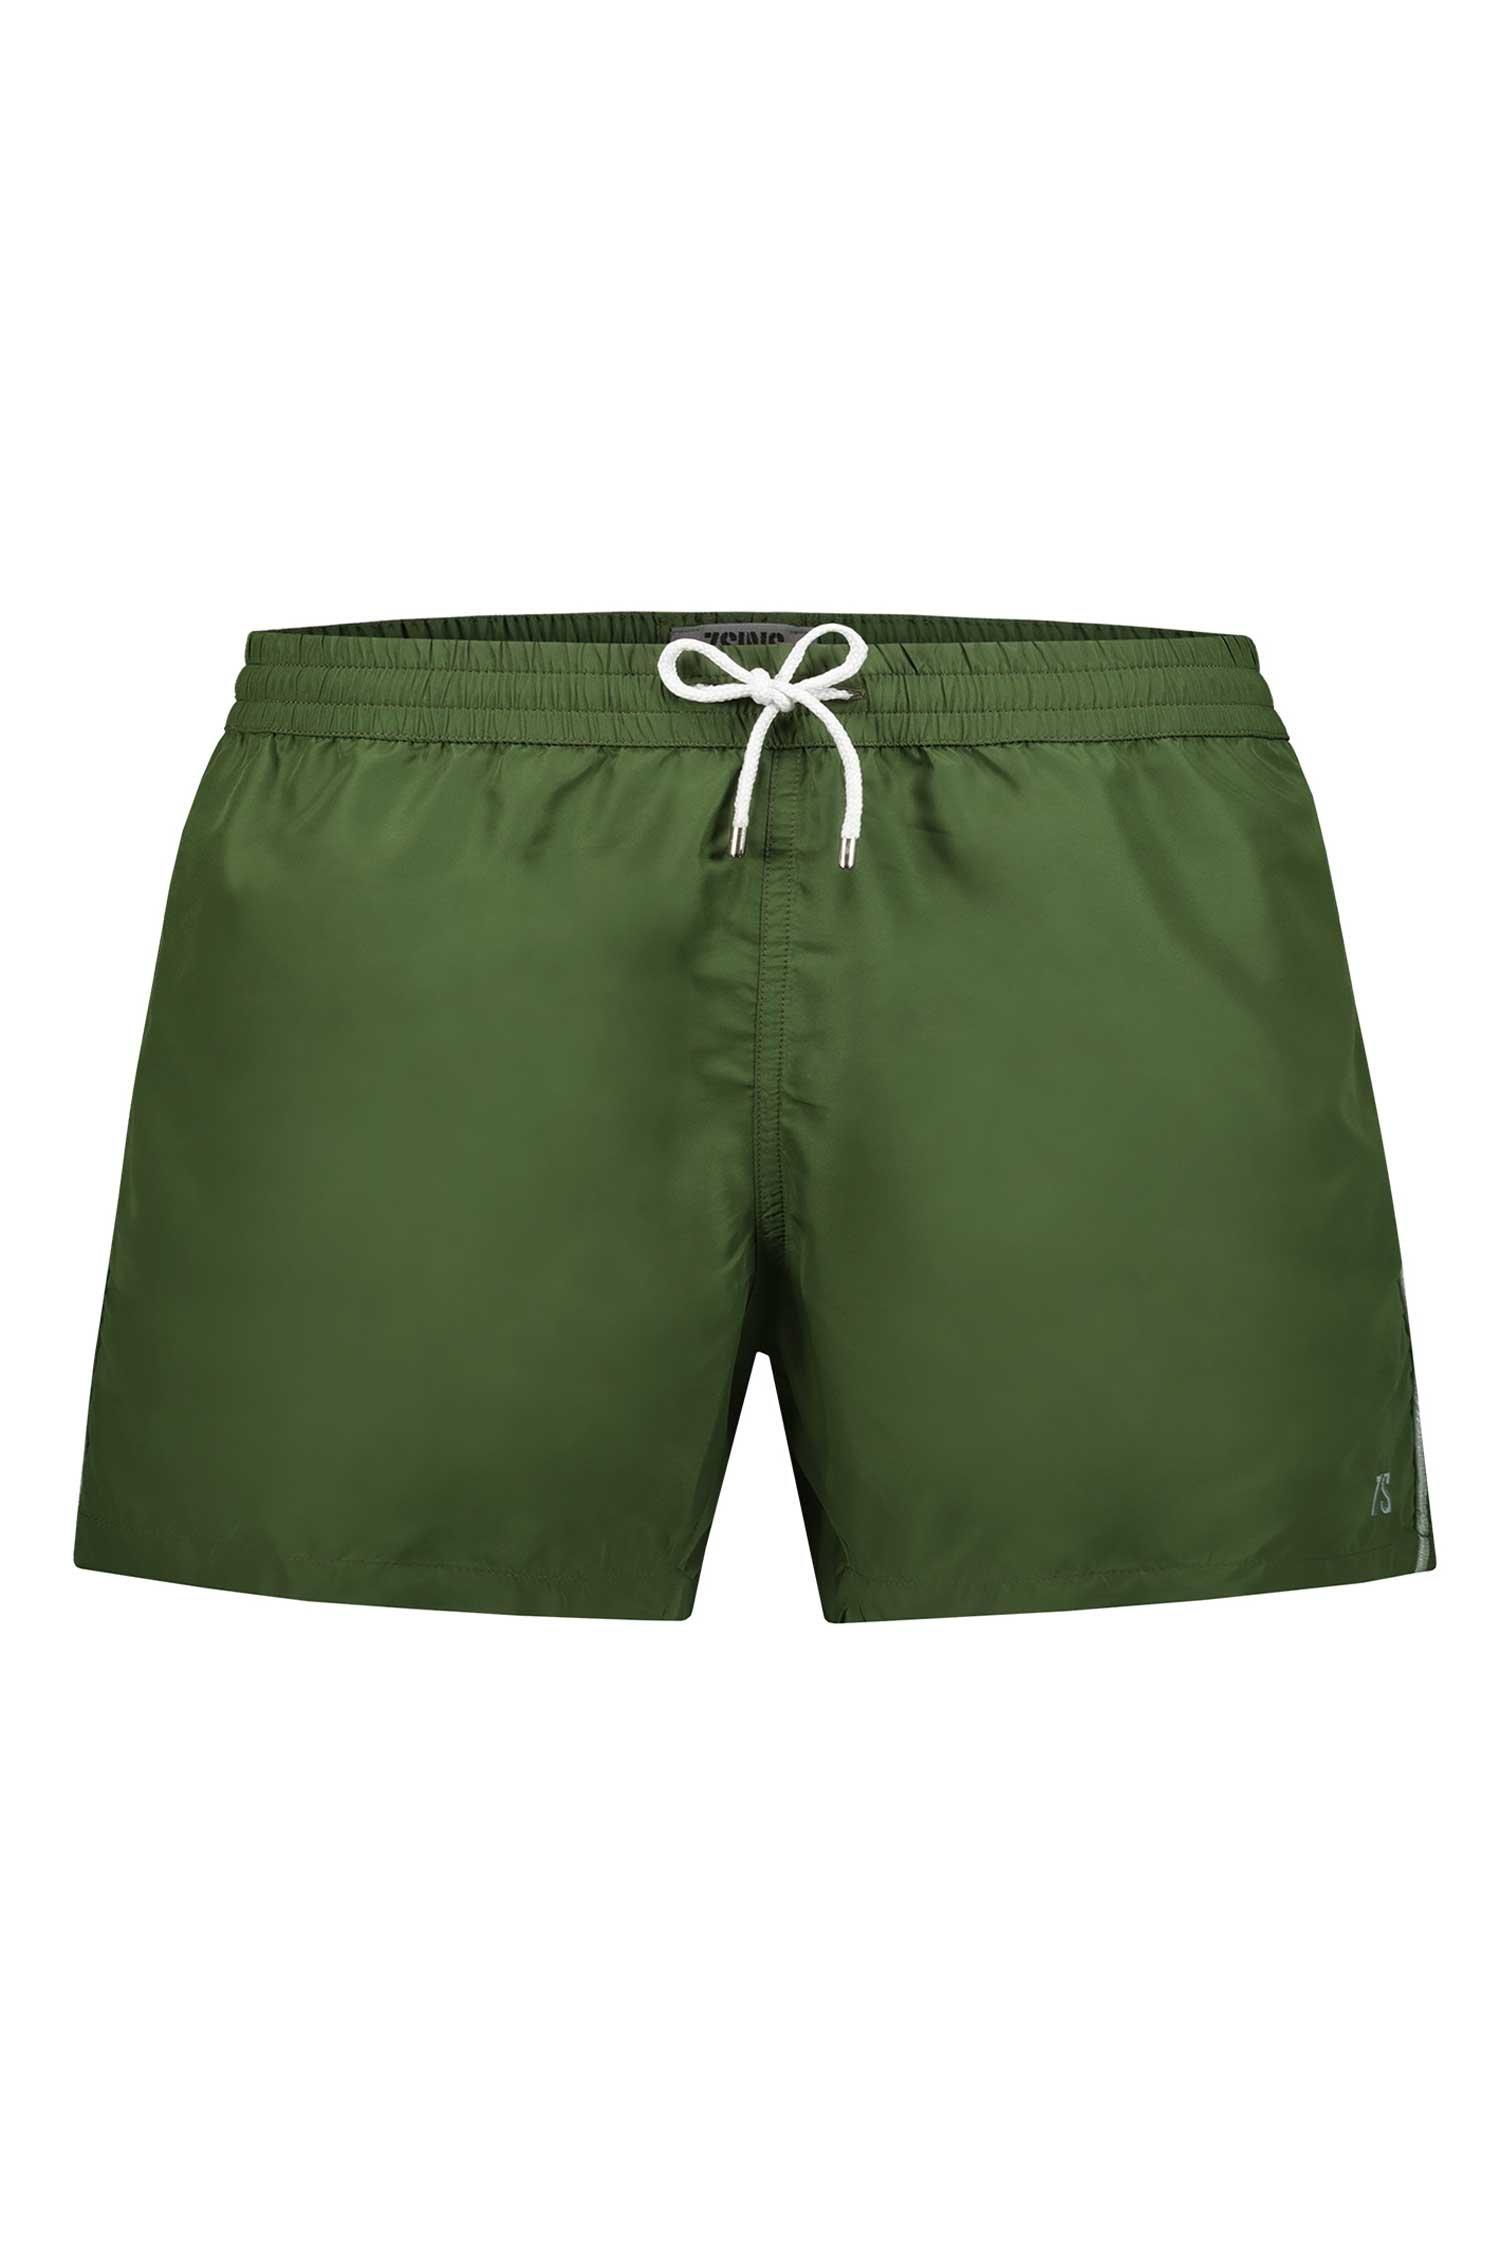 Beach Boxer Men - Verde Militare 104 Man